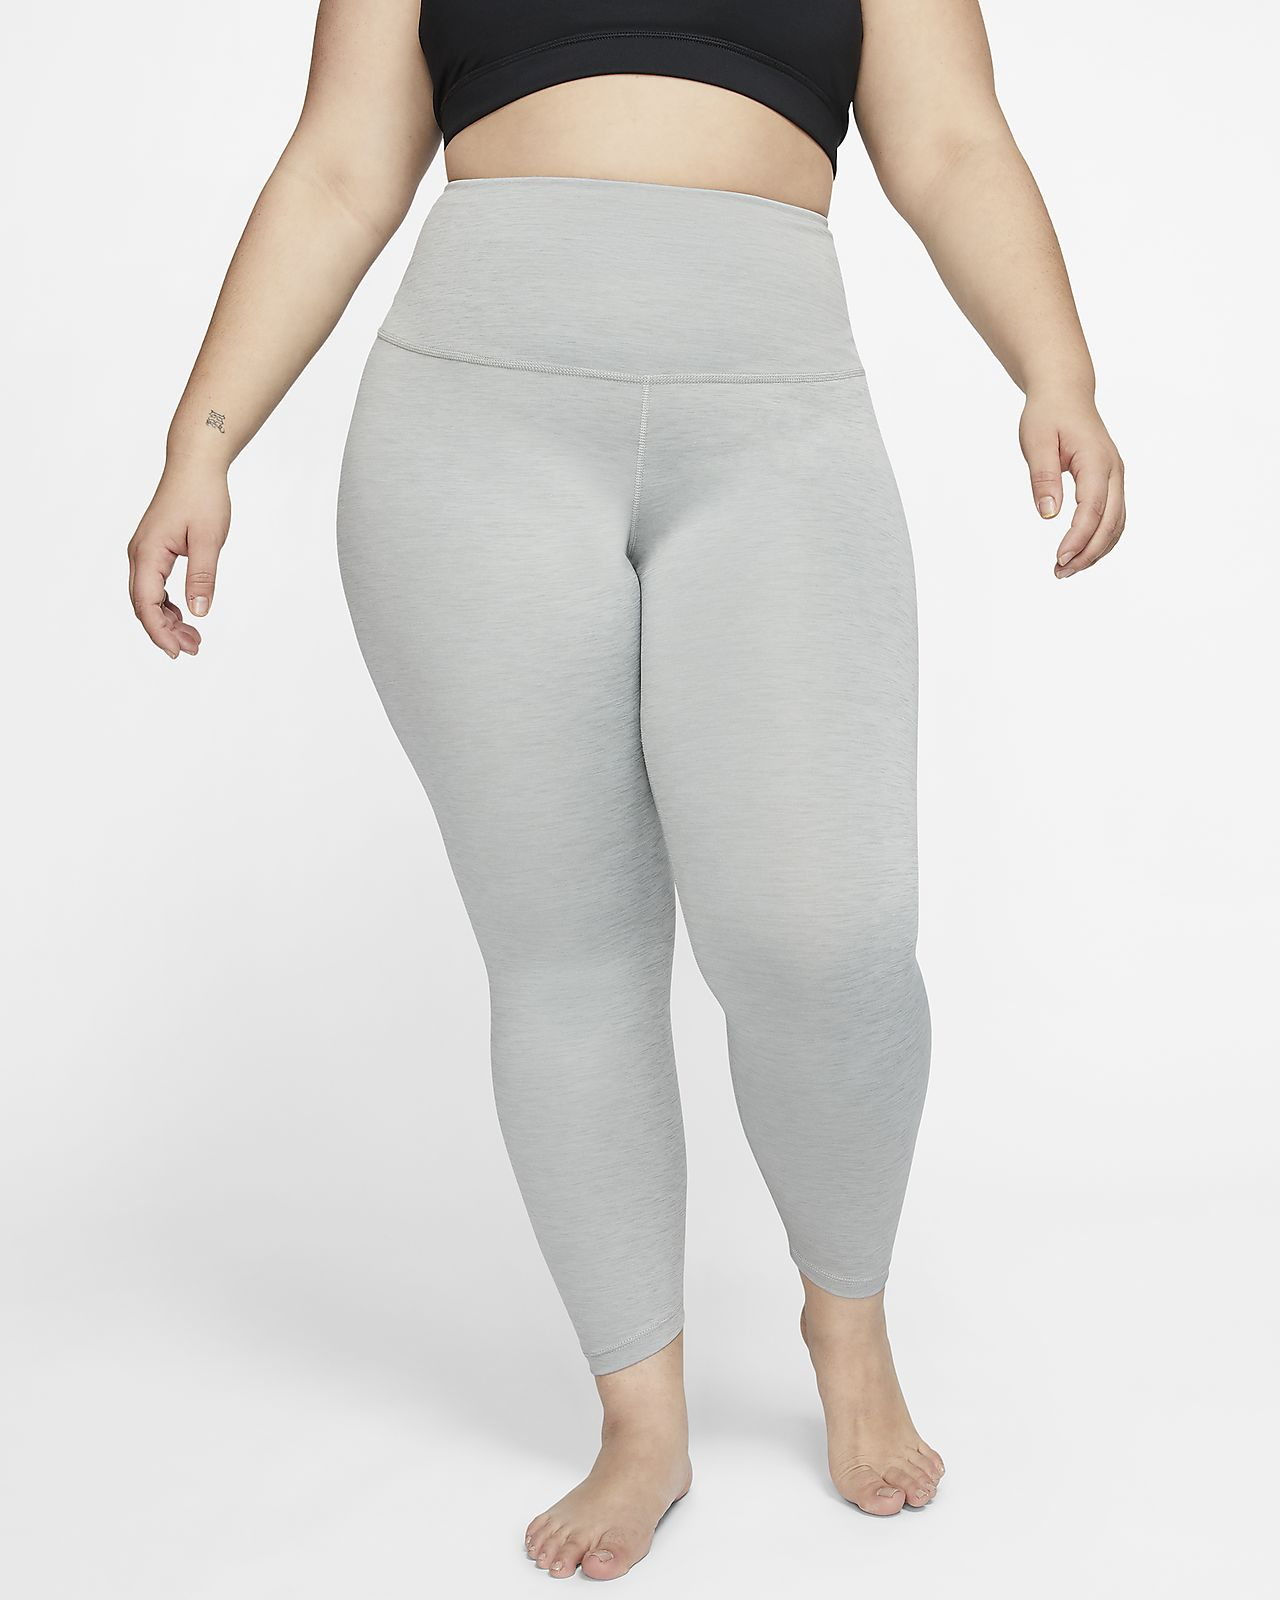 Leggings fruncidos de 7/8 para mujer Nike Yoga (talla grande)